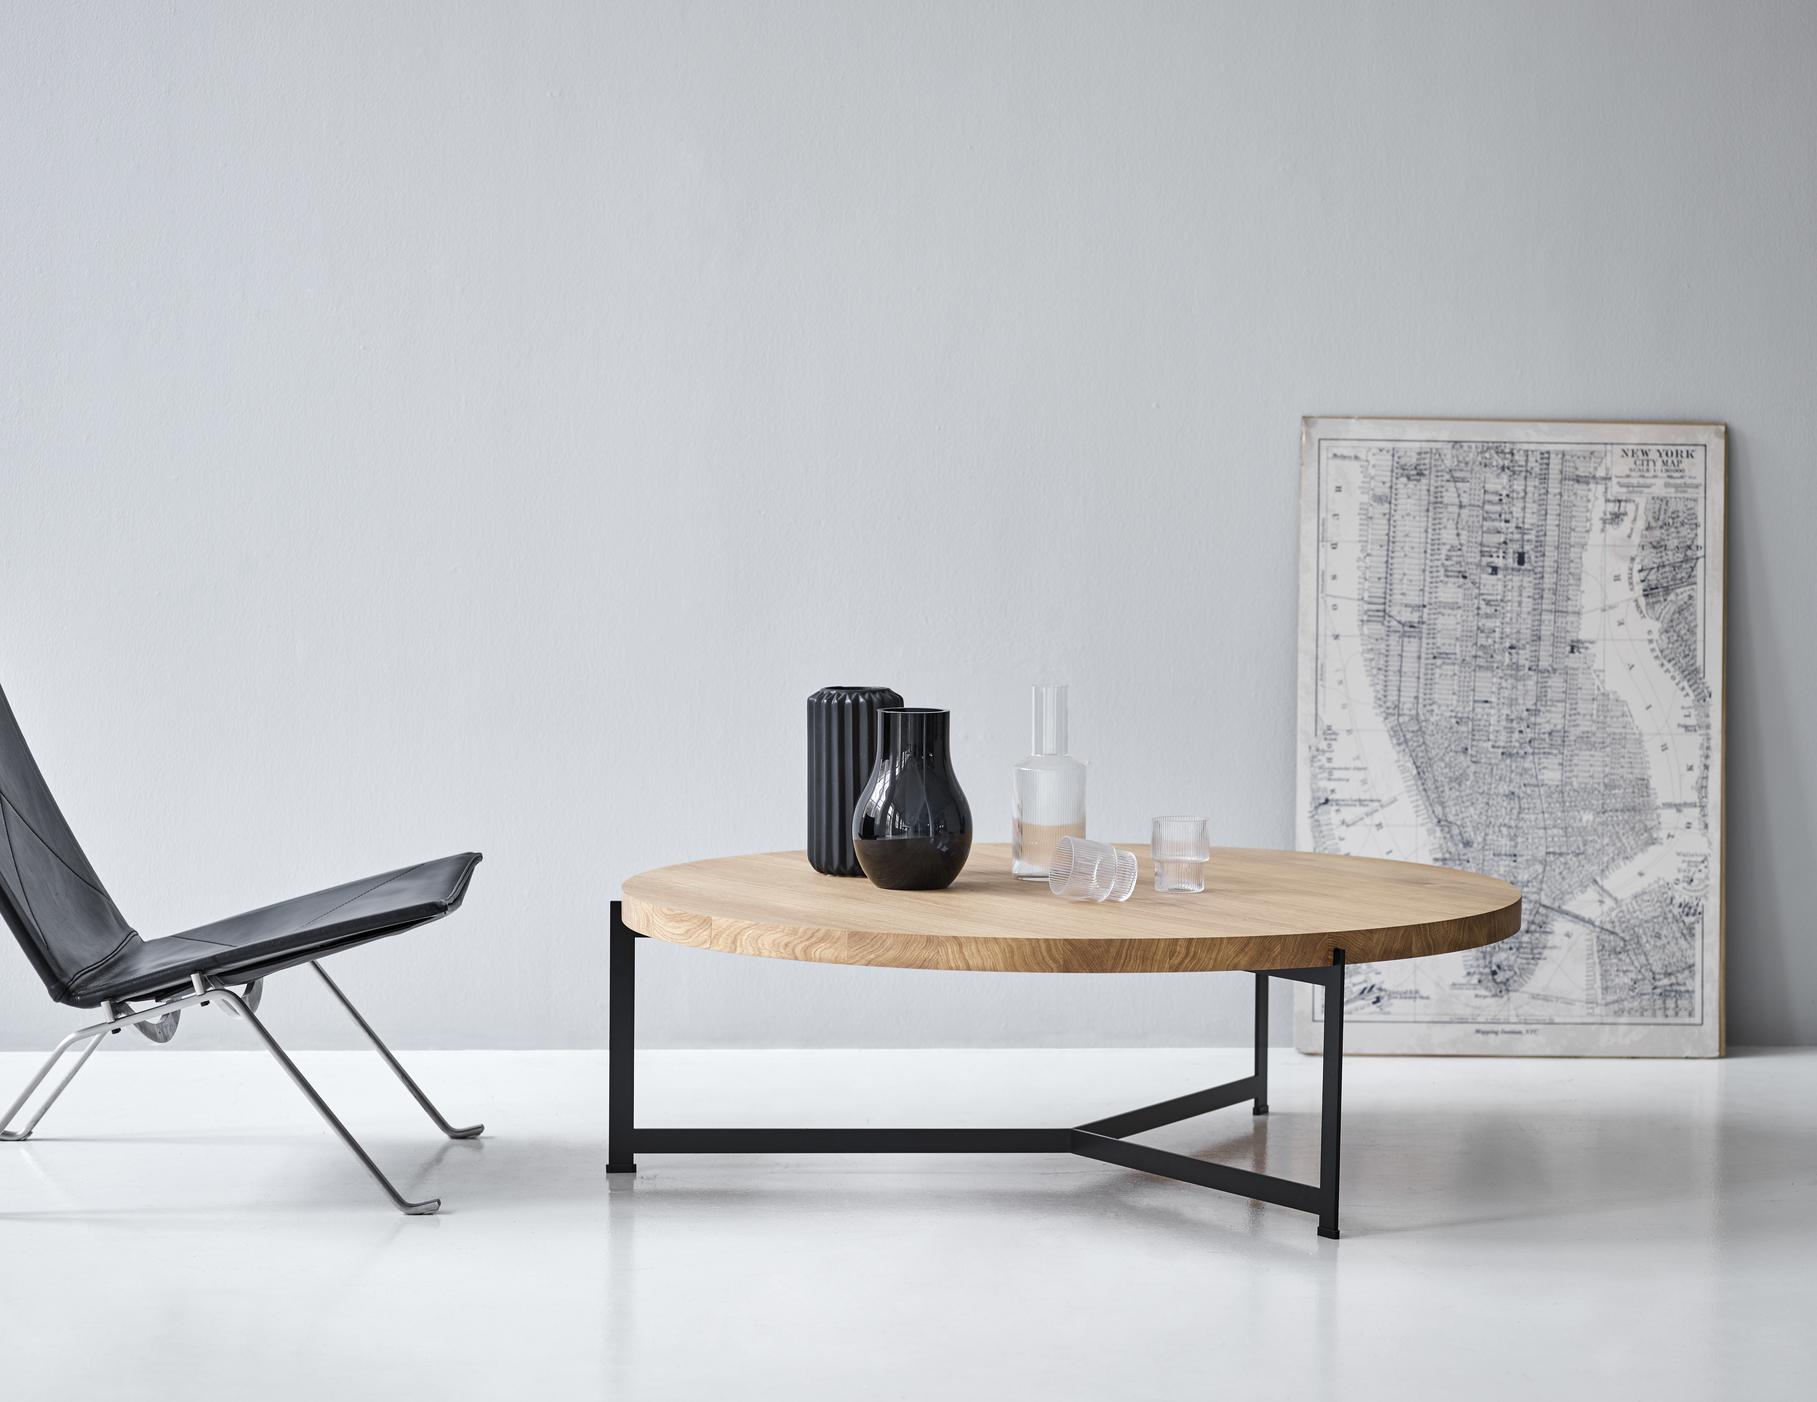 dk3,denmark,デンマーク,アクタス,actus,家具,無垢,北欧家具,デザイン,テーブル